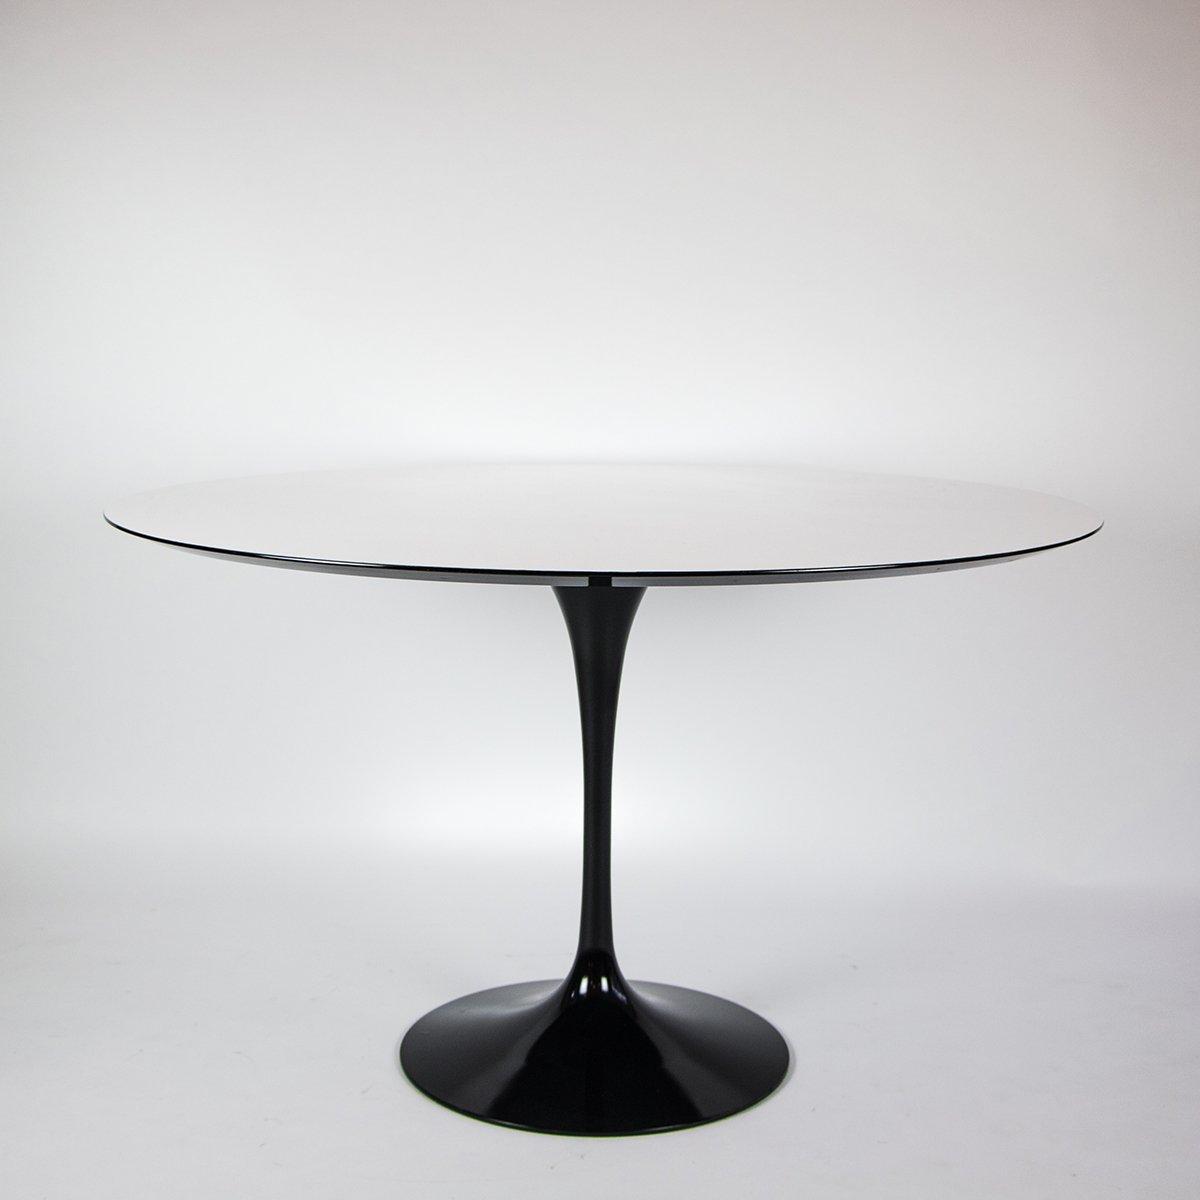 Vintage Tulip Table By Eero Saarinen For Knoll